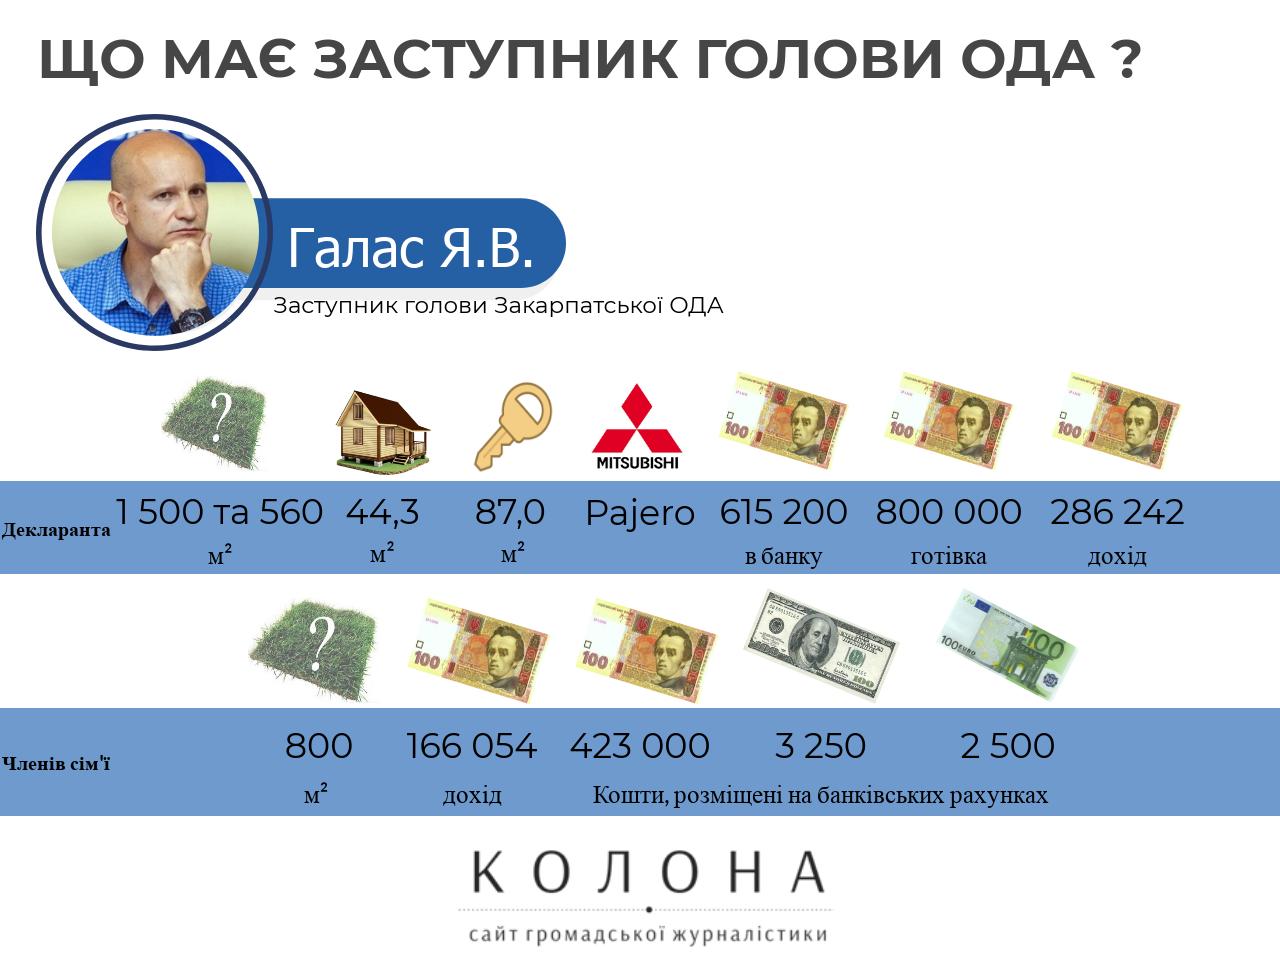 Ярослав Галас Закарпаття